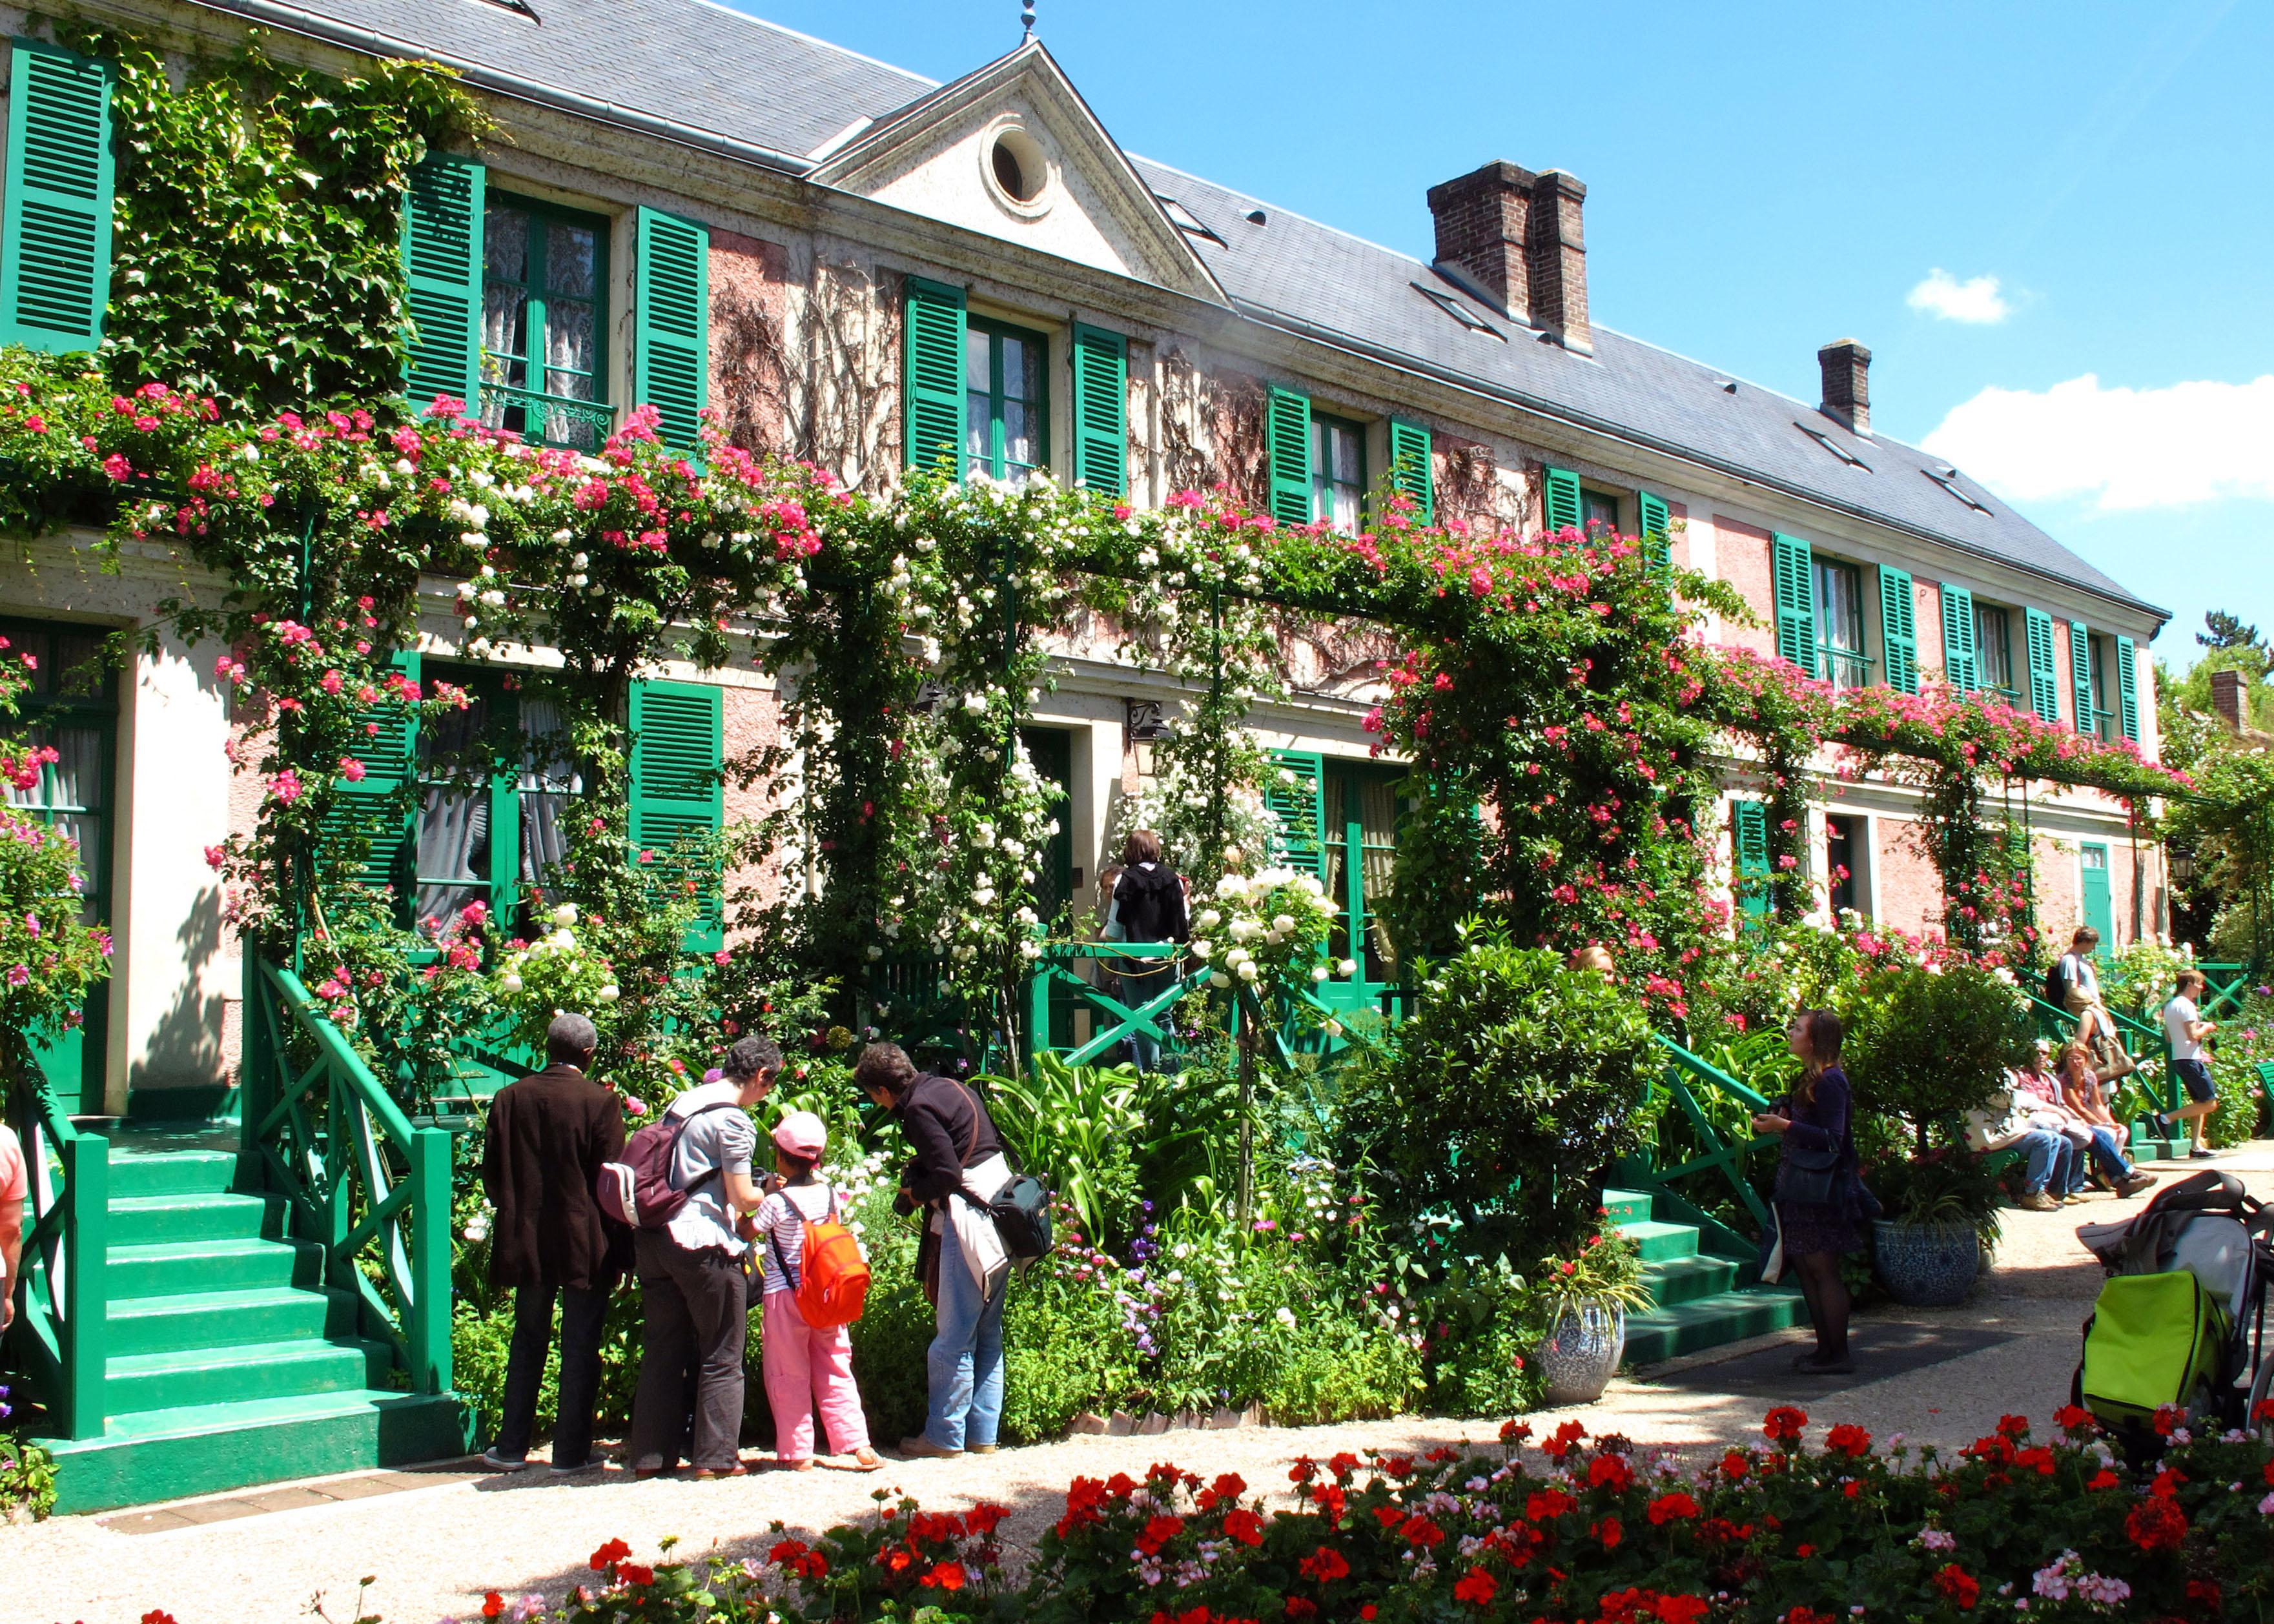 Venture through the mystical gardens that inspired Monet